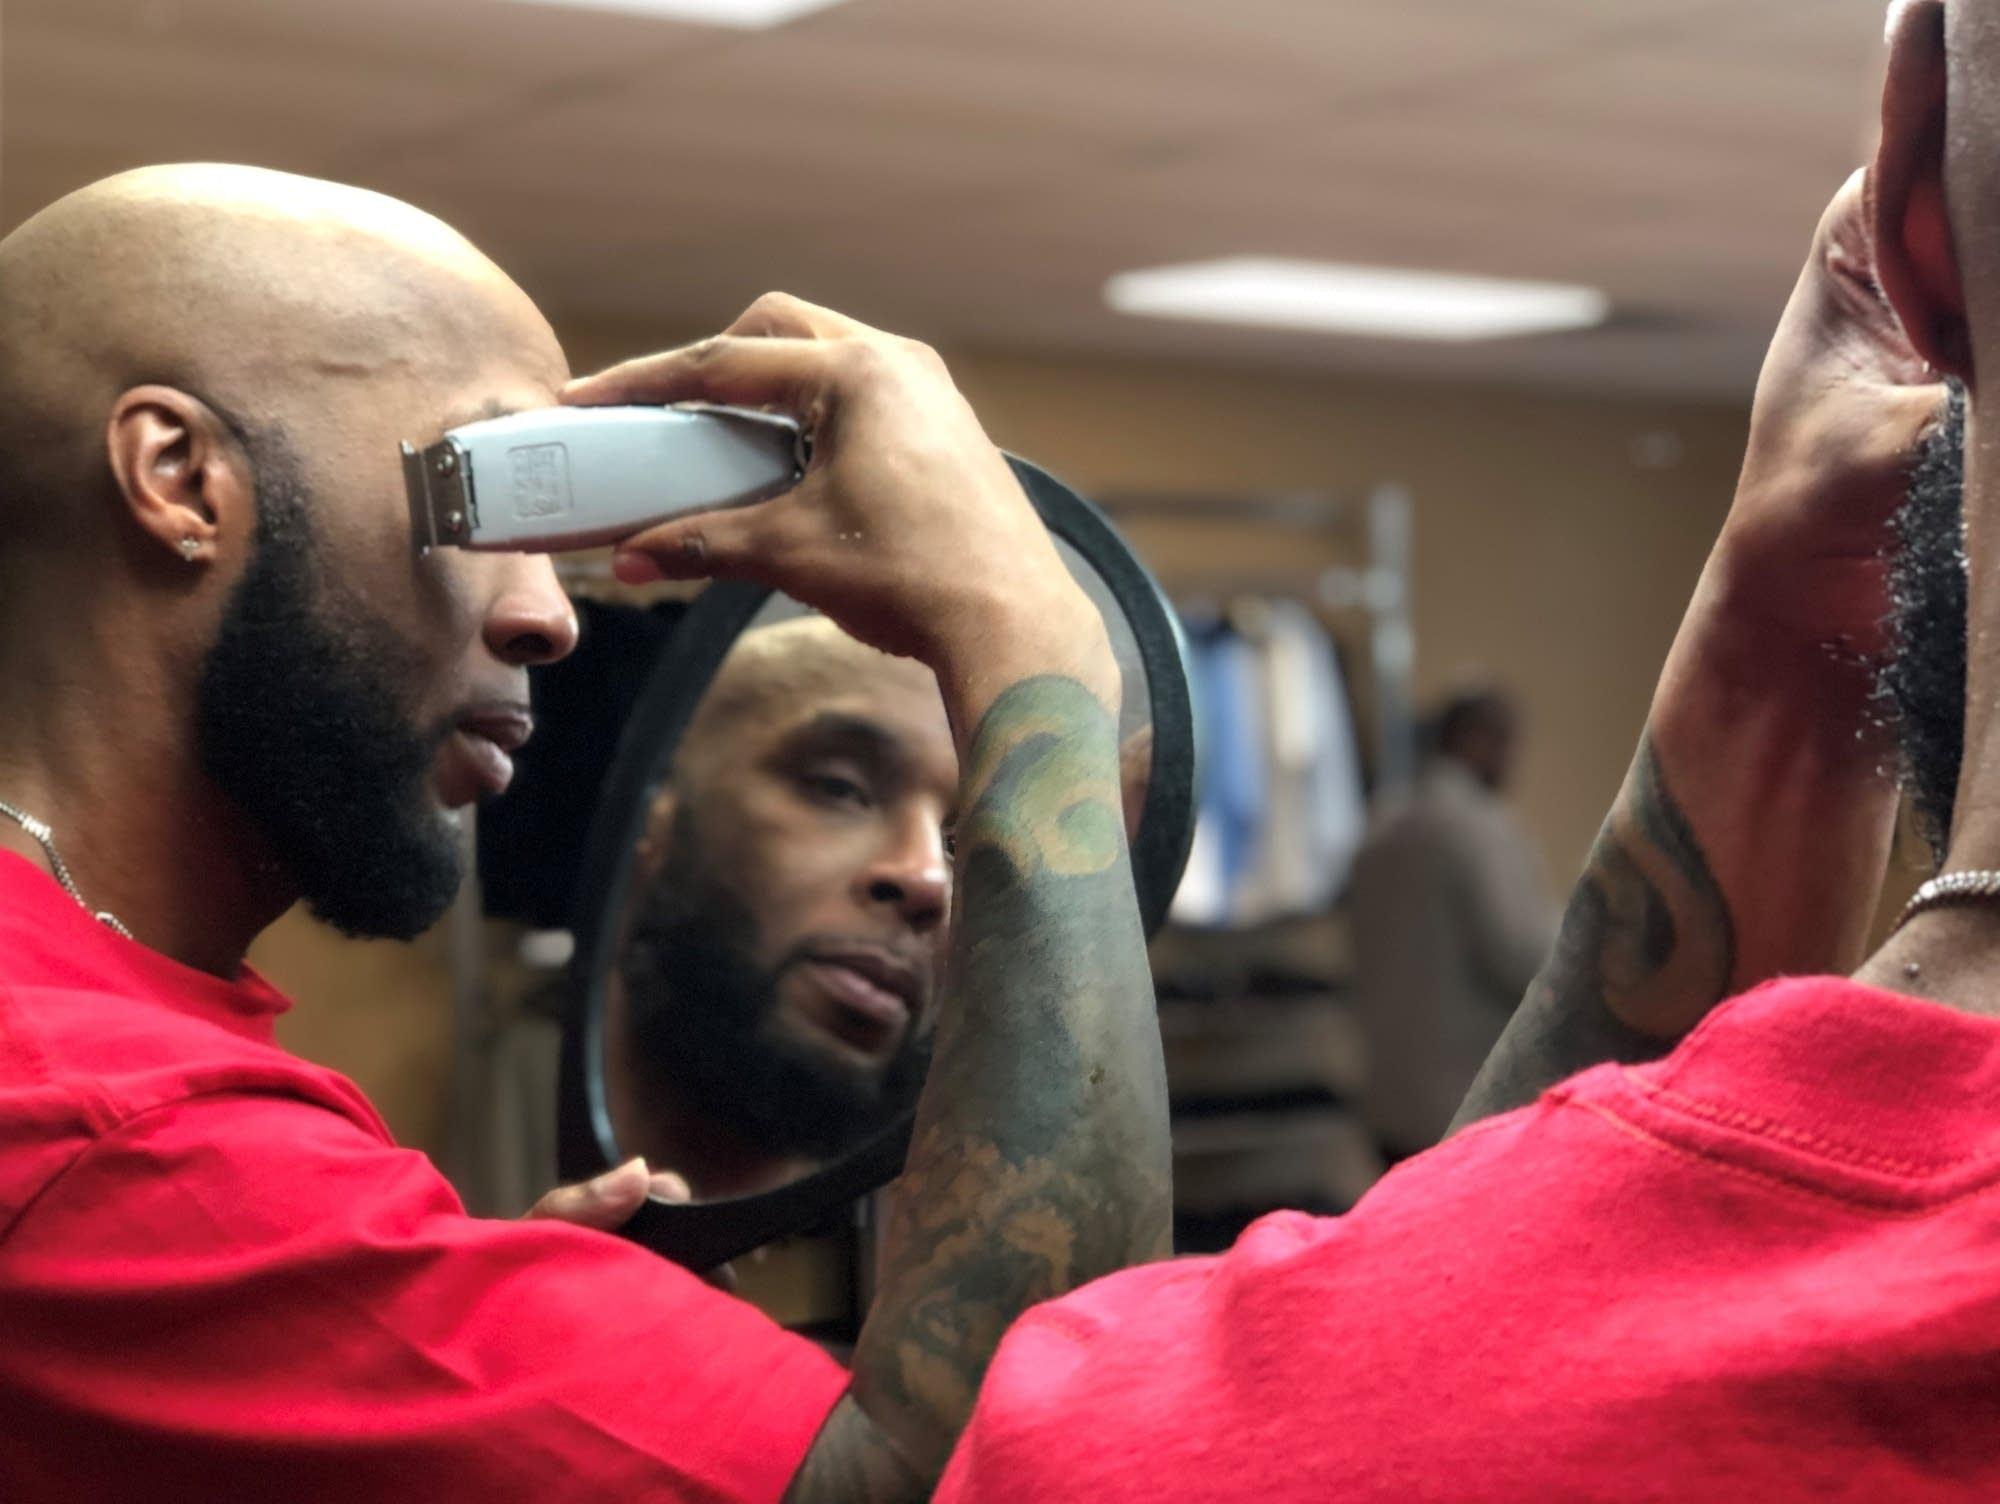 Gilbert Jordan is the lead barber at Barbershop Social Services